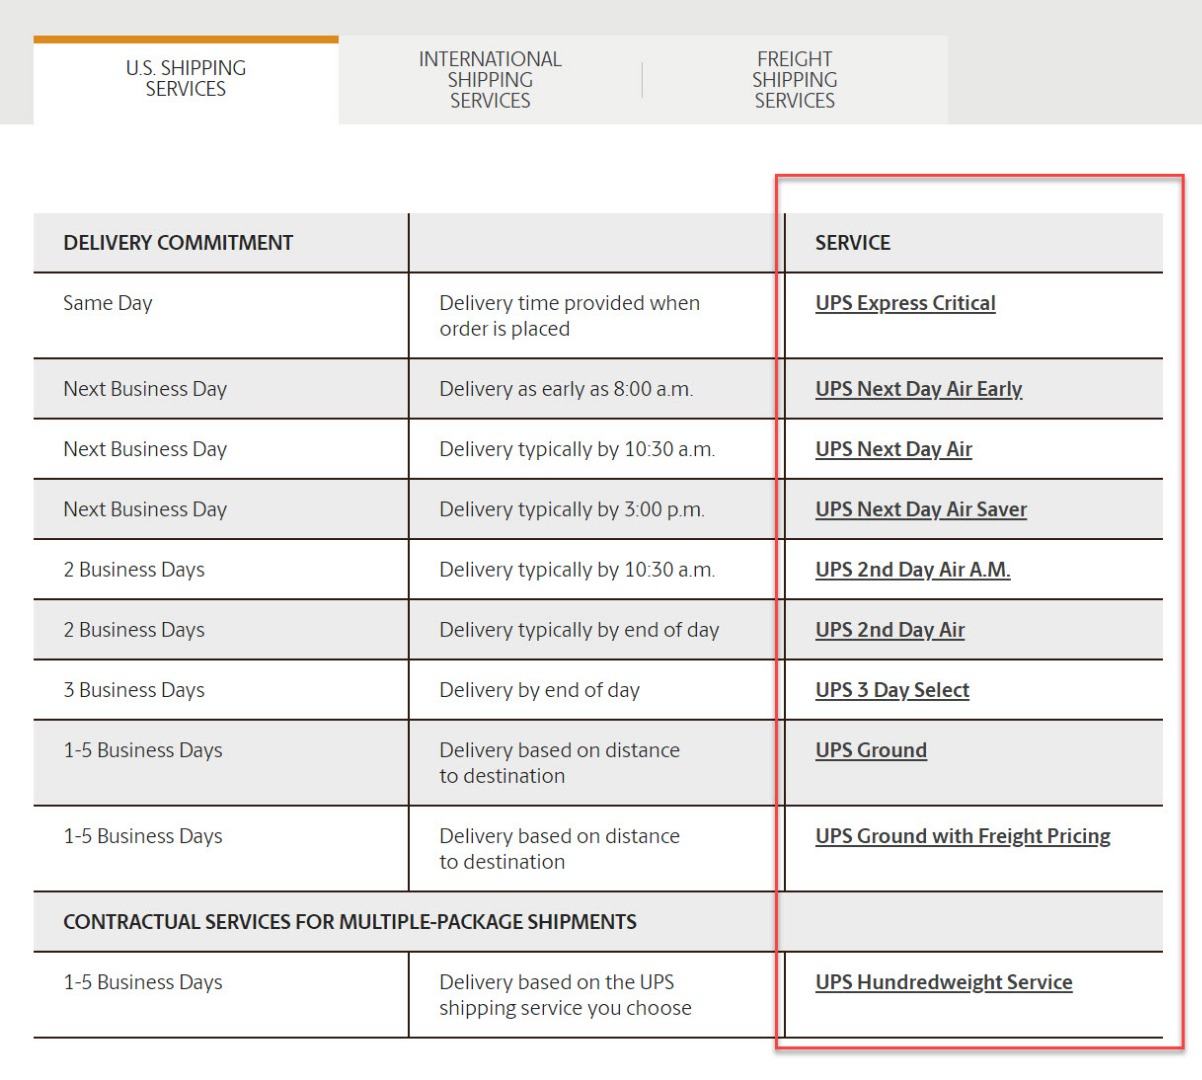 HikaShop - names of UPS services do not match - HikaShop